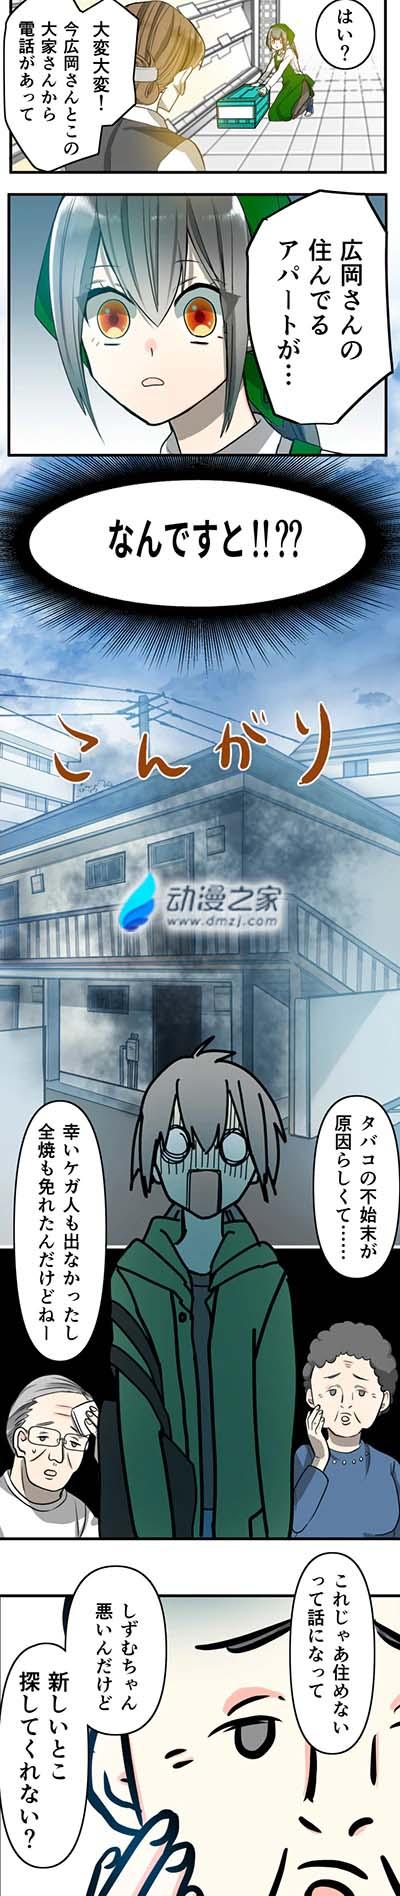 watatui_01.webp.jpg